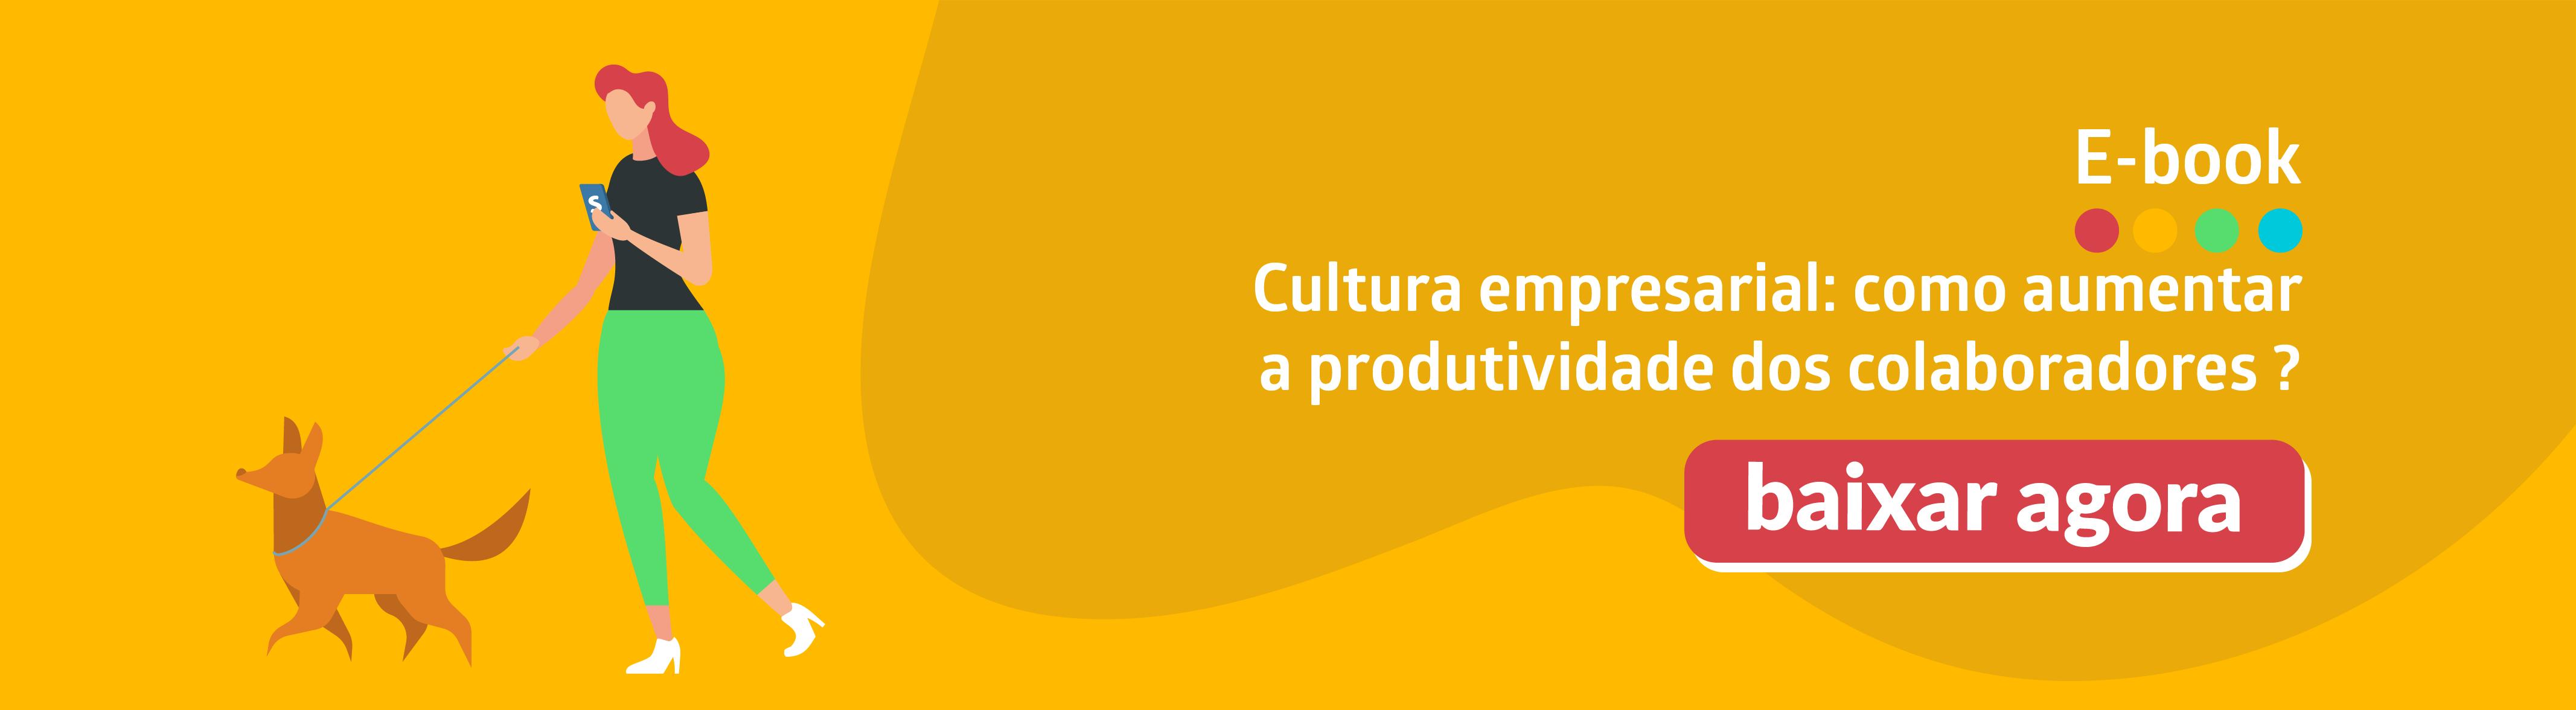 Banner_Cultura_Empresarial_Como_Aumentar_Produtividade